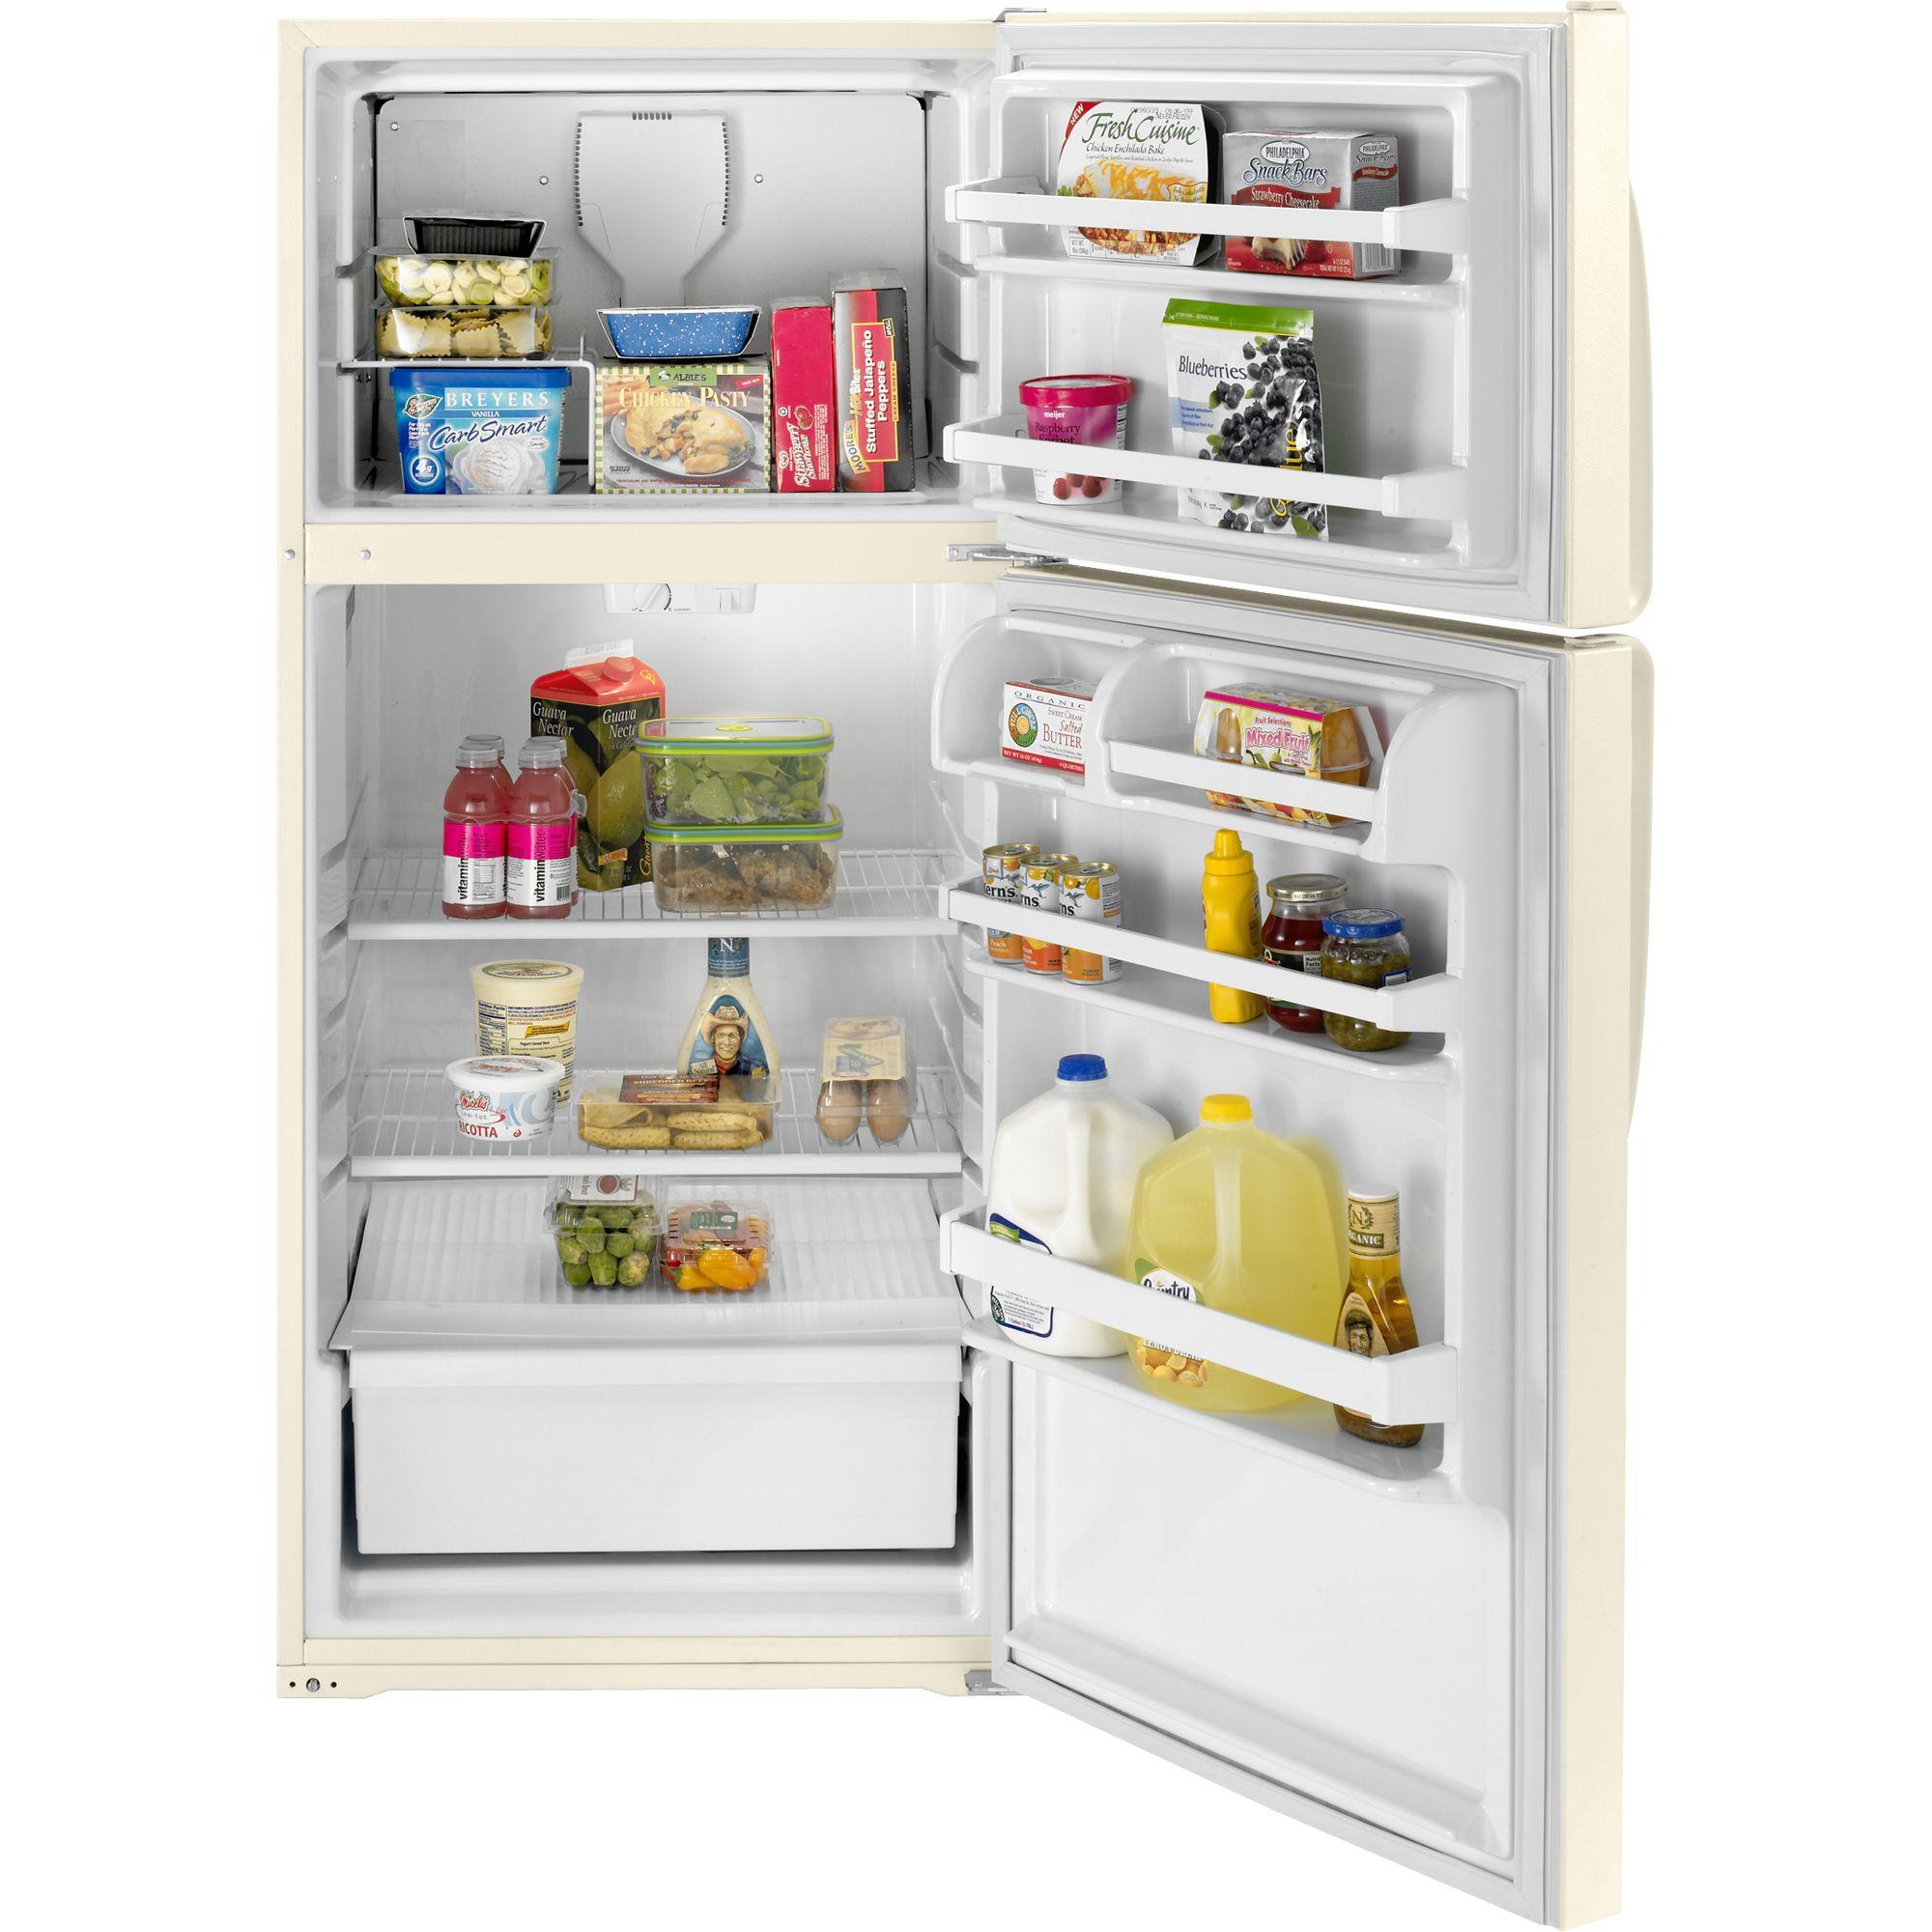 Whirlpool 16.0 cu. ft. Top Freezer Refrigerator